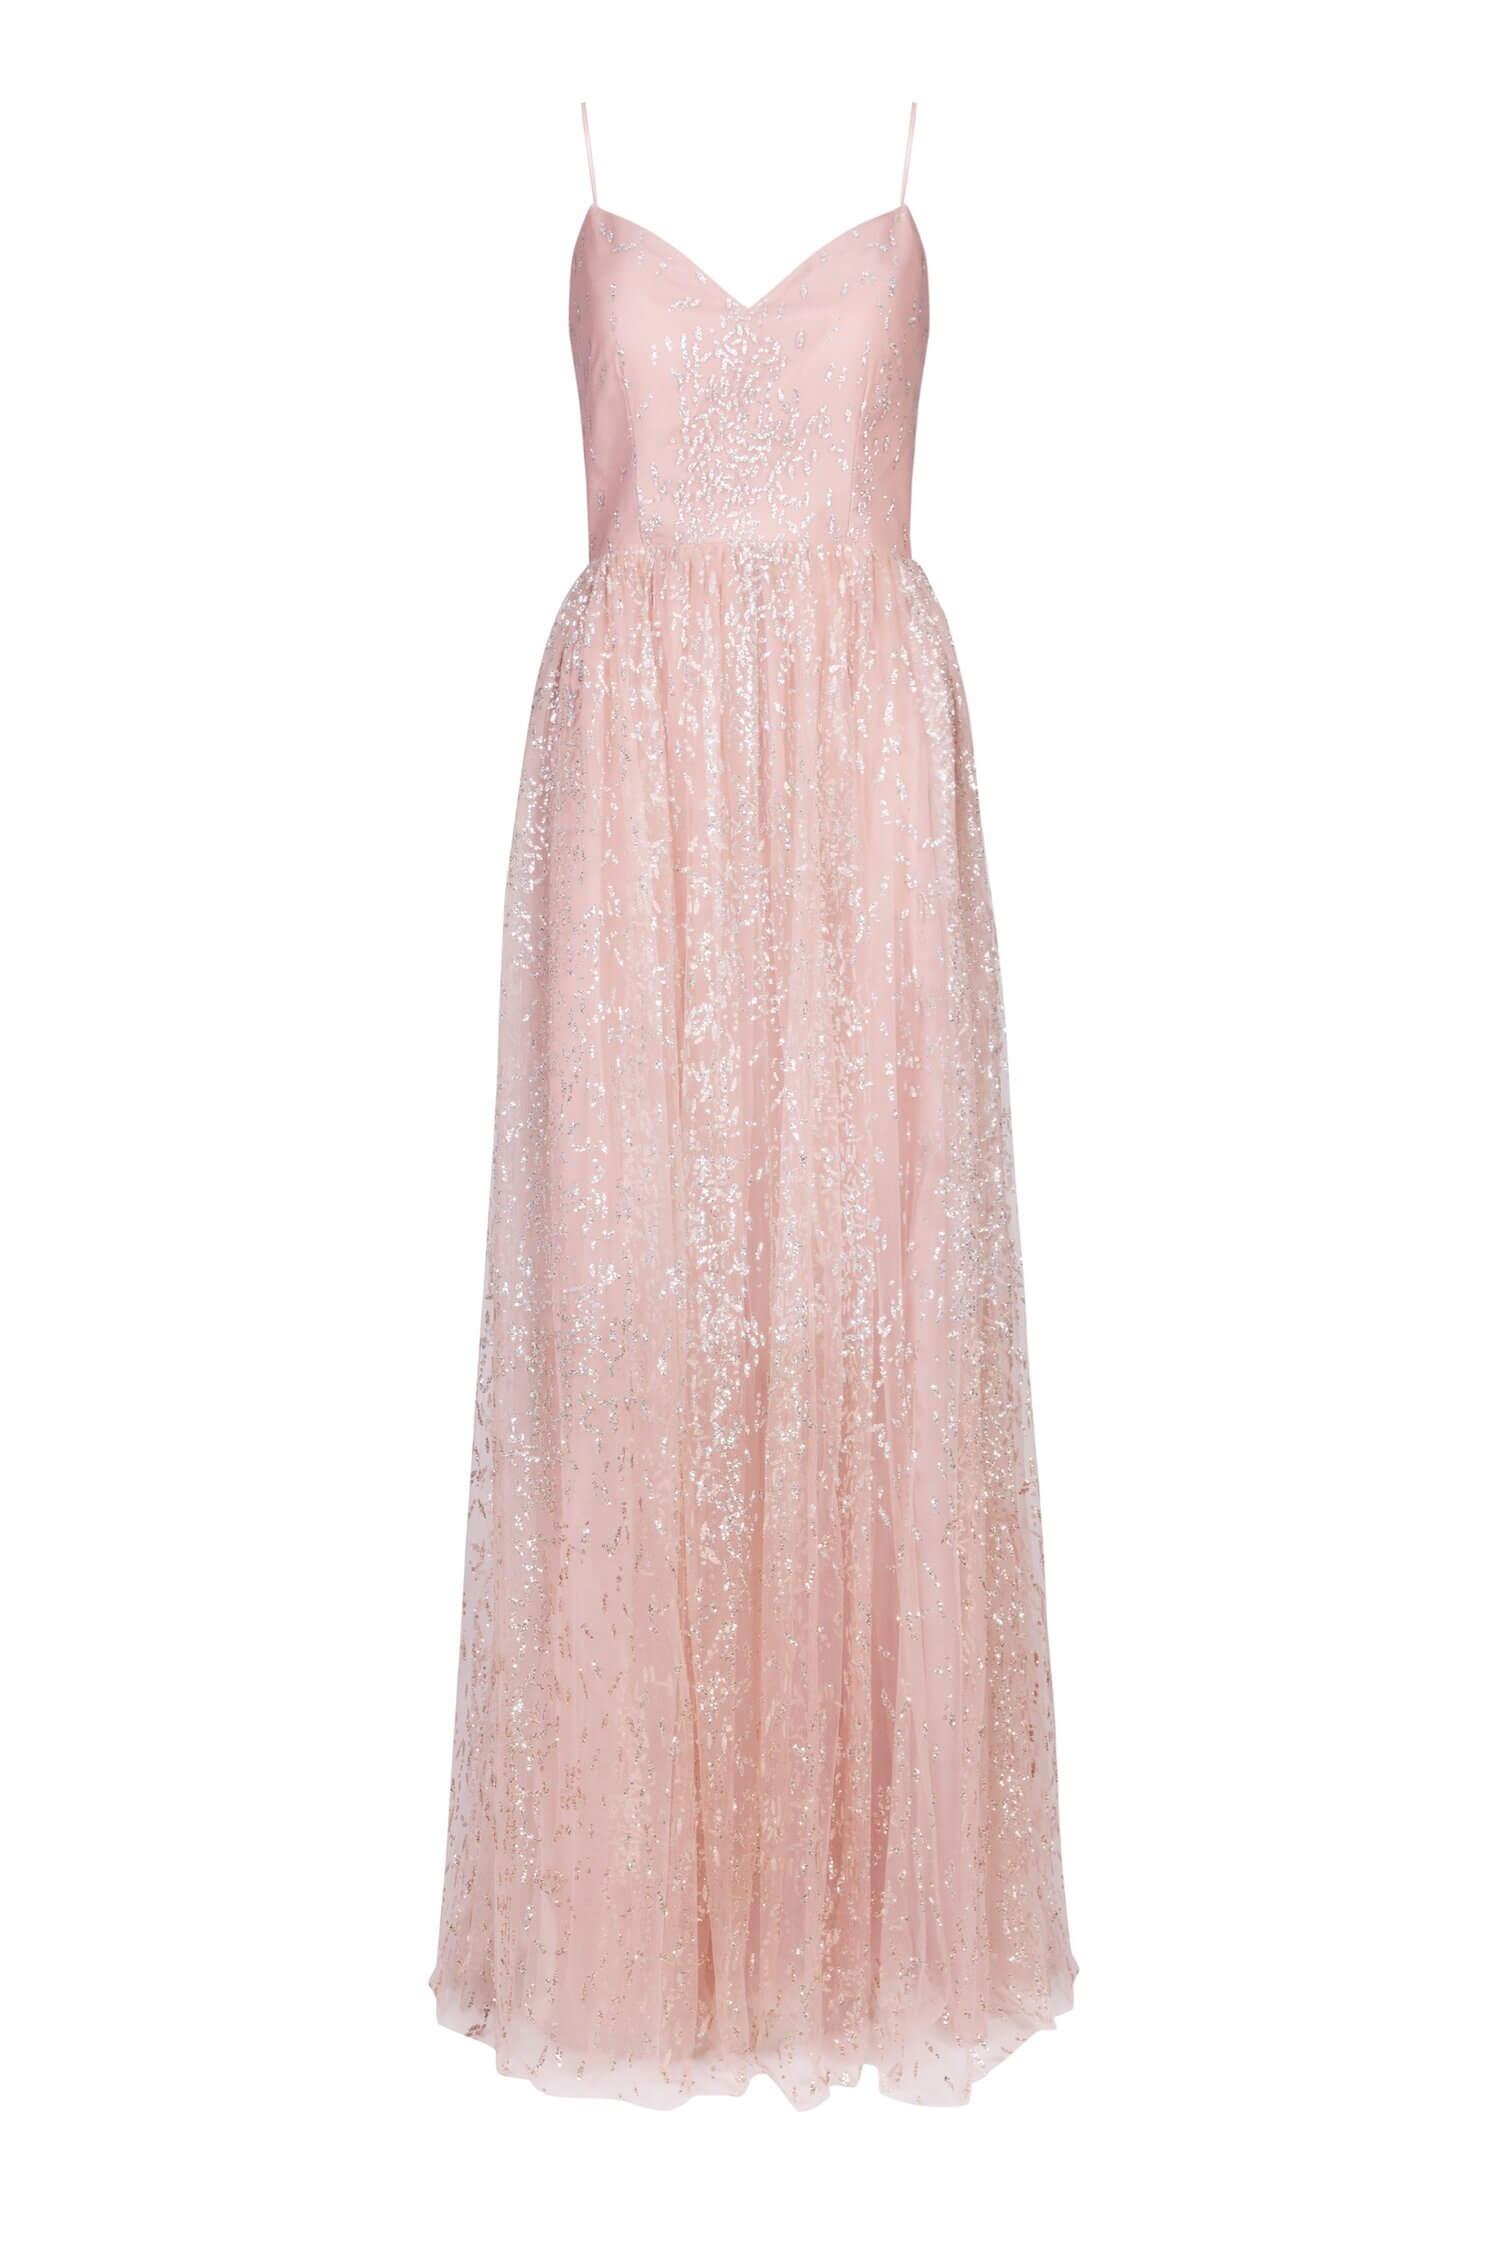 TH&H Bridesmaid Dress TH&H Bridesmaid Dress Blush